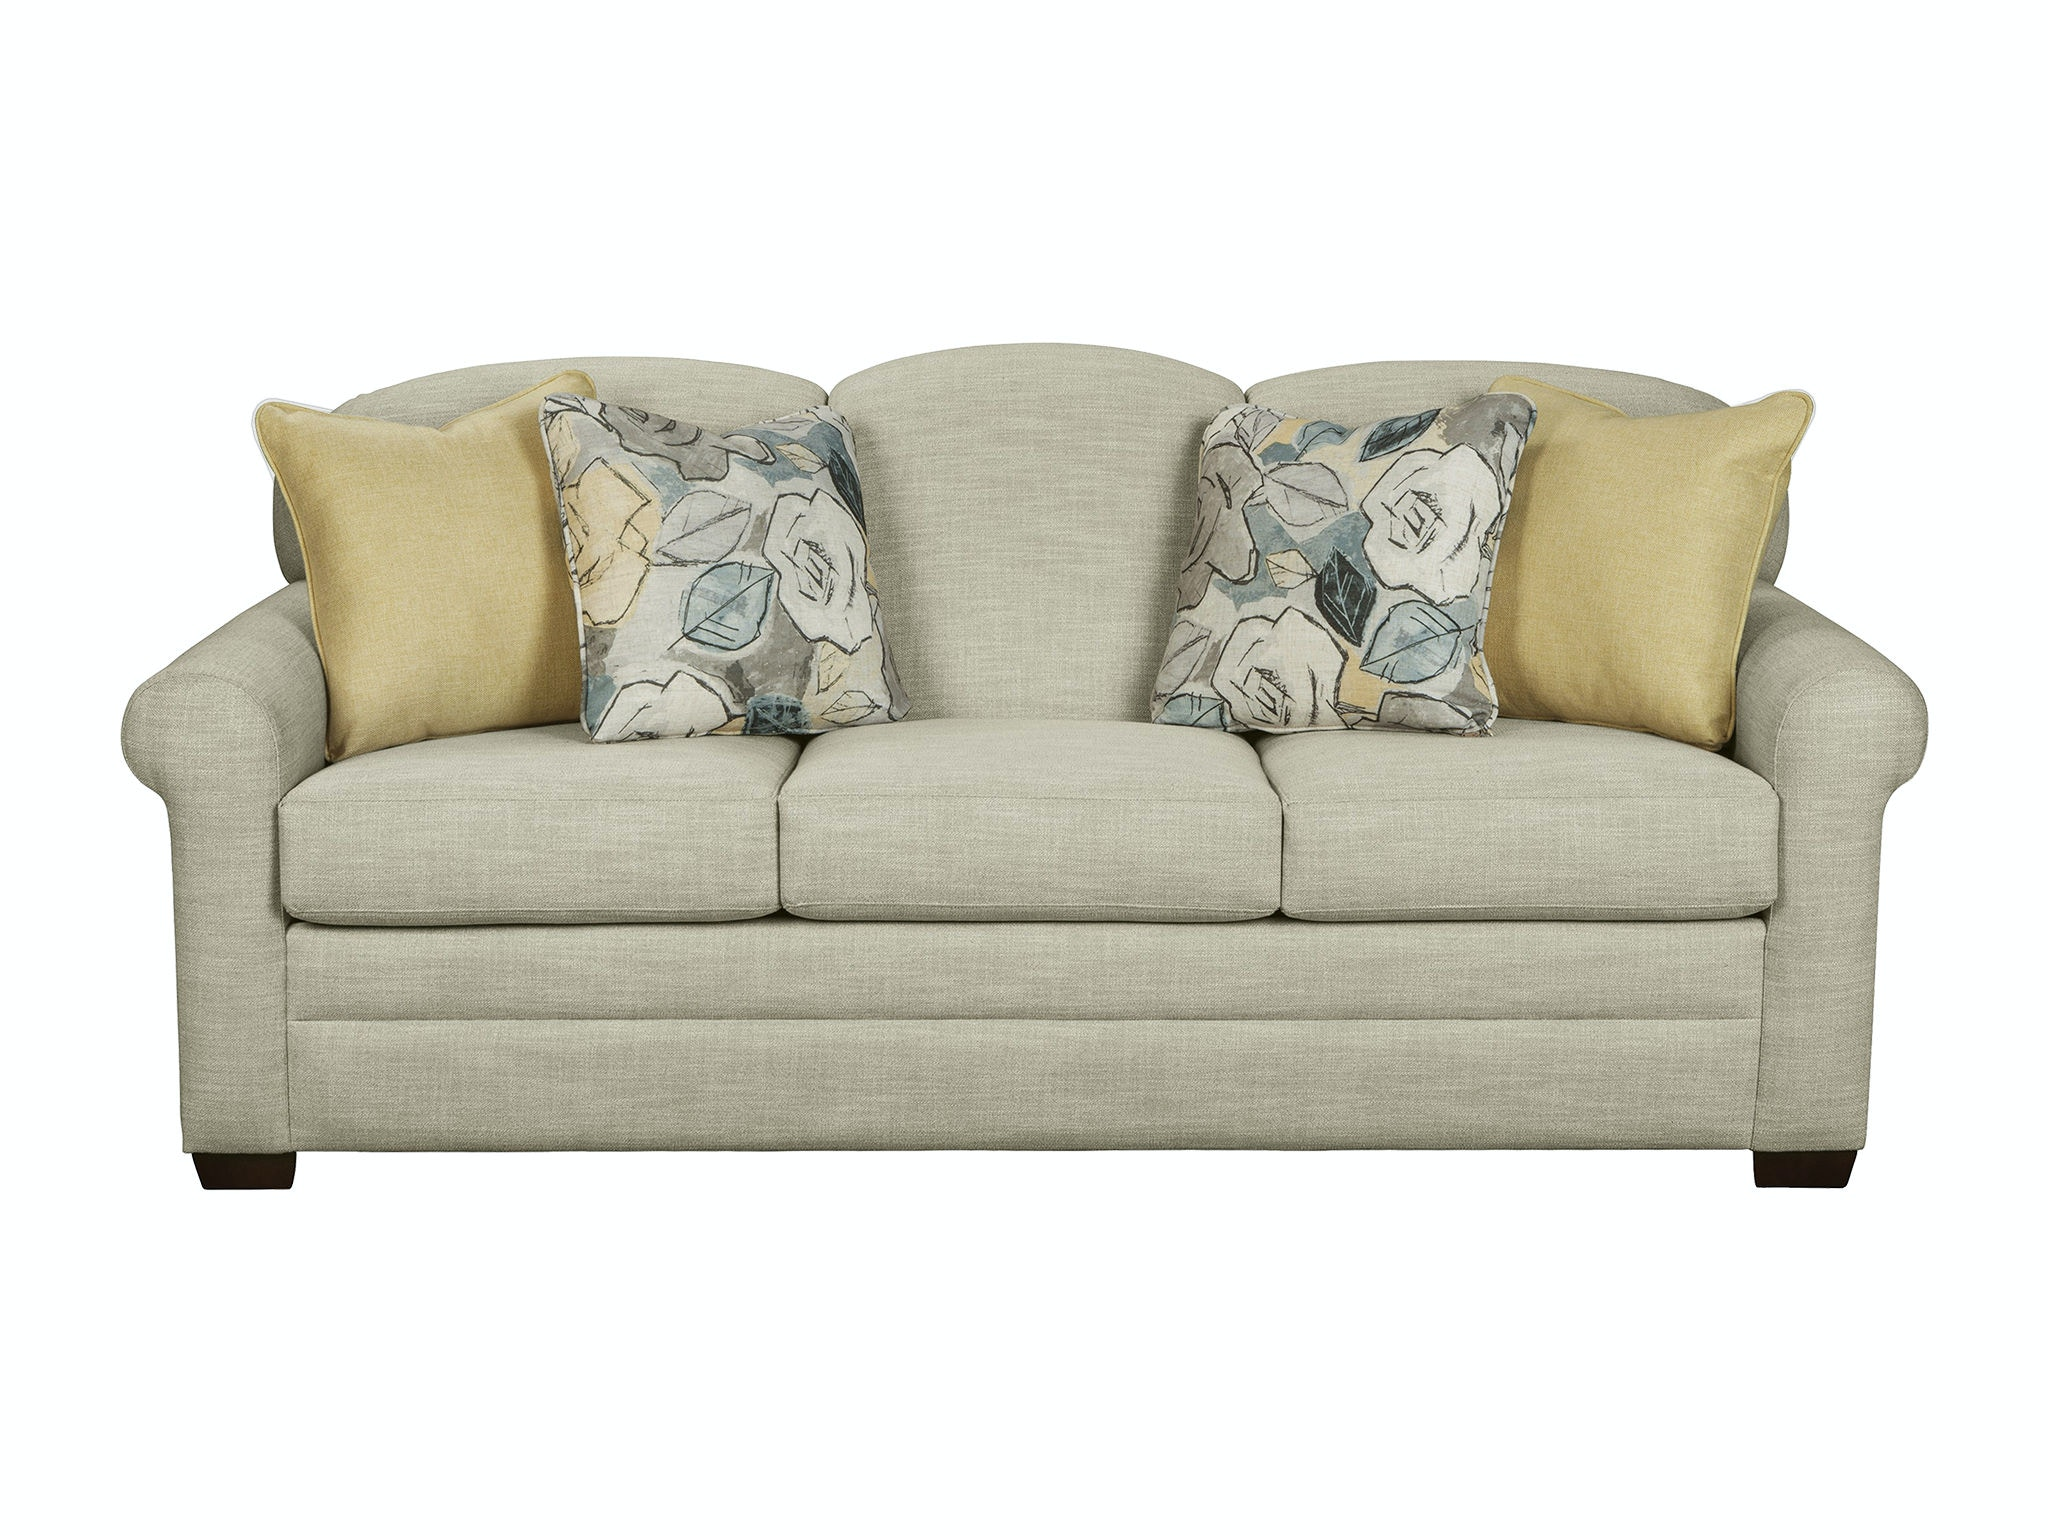 Craftmaster Living Room Sleeper Sofa 77845068 CraftMaster